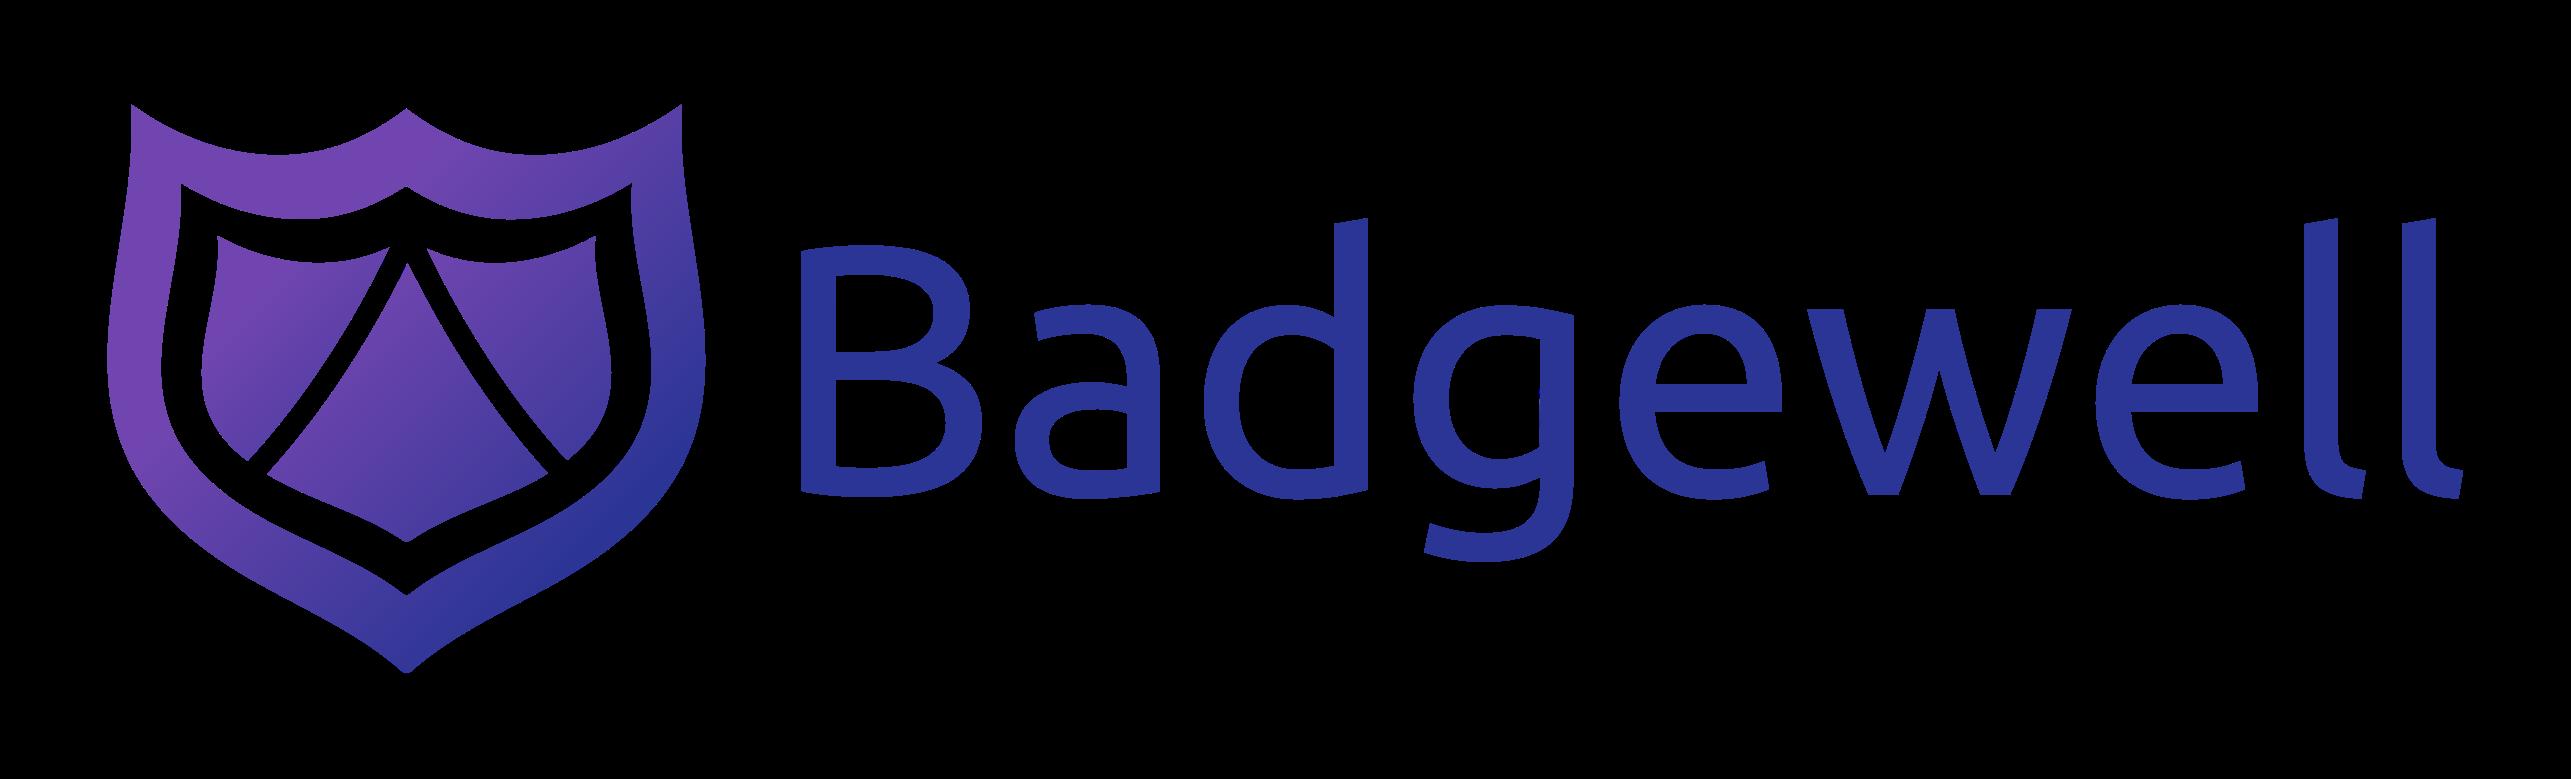 Badgewell